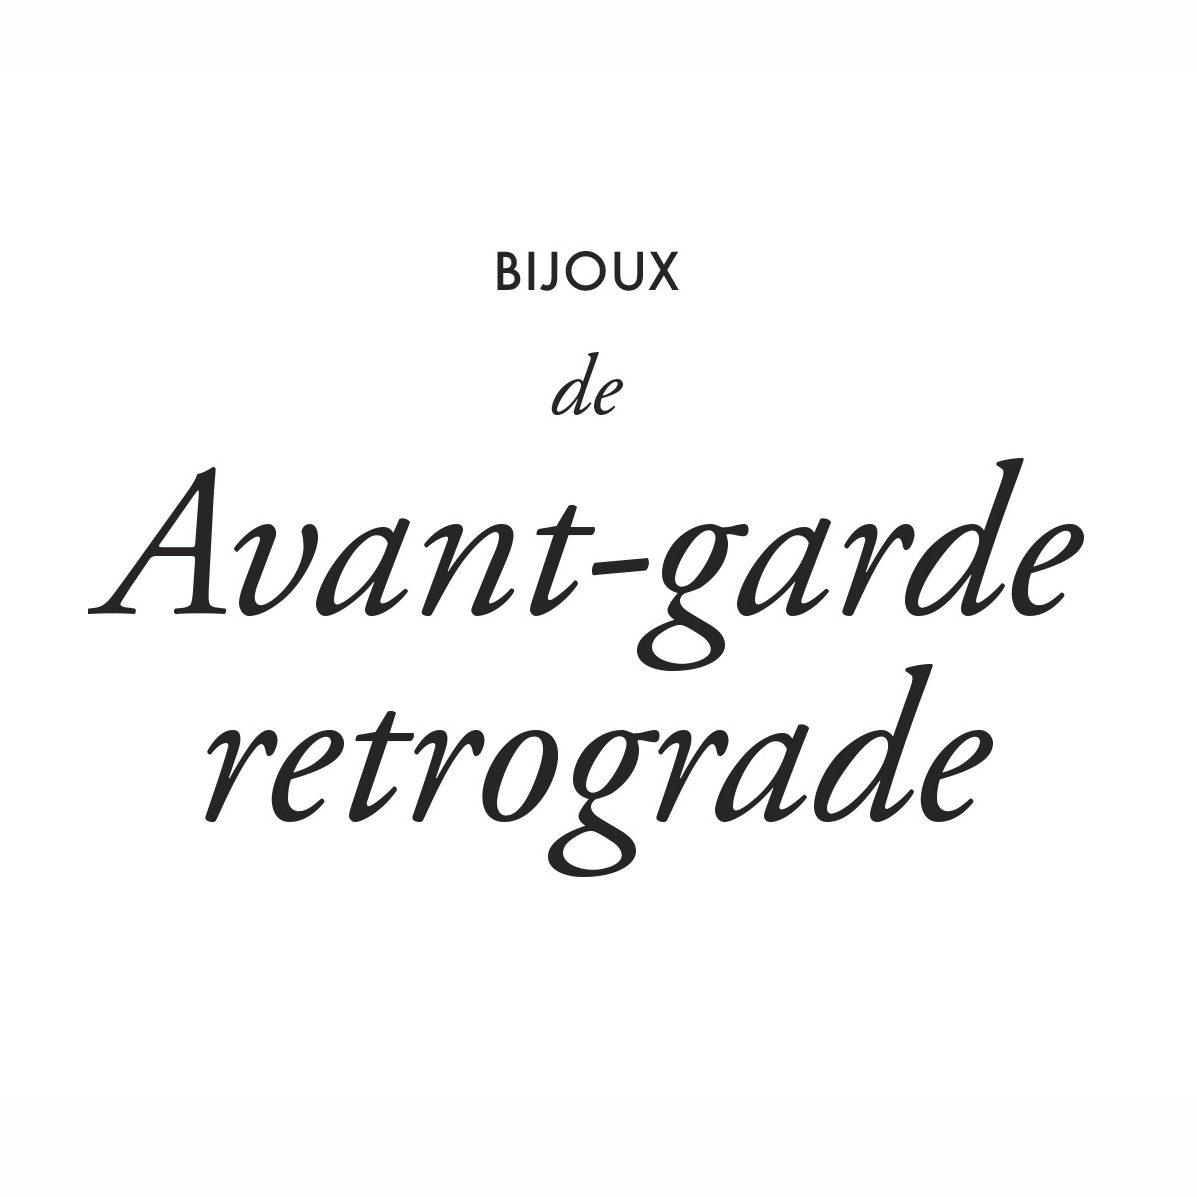 BIJOUX DE AVANT-GARDE RETROGRADE